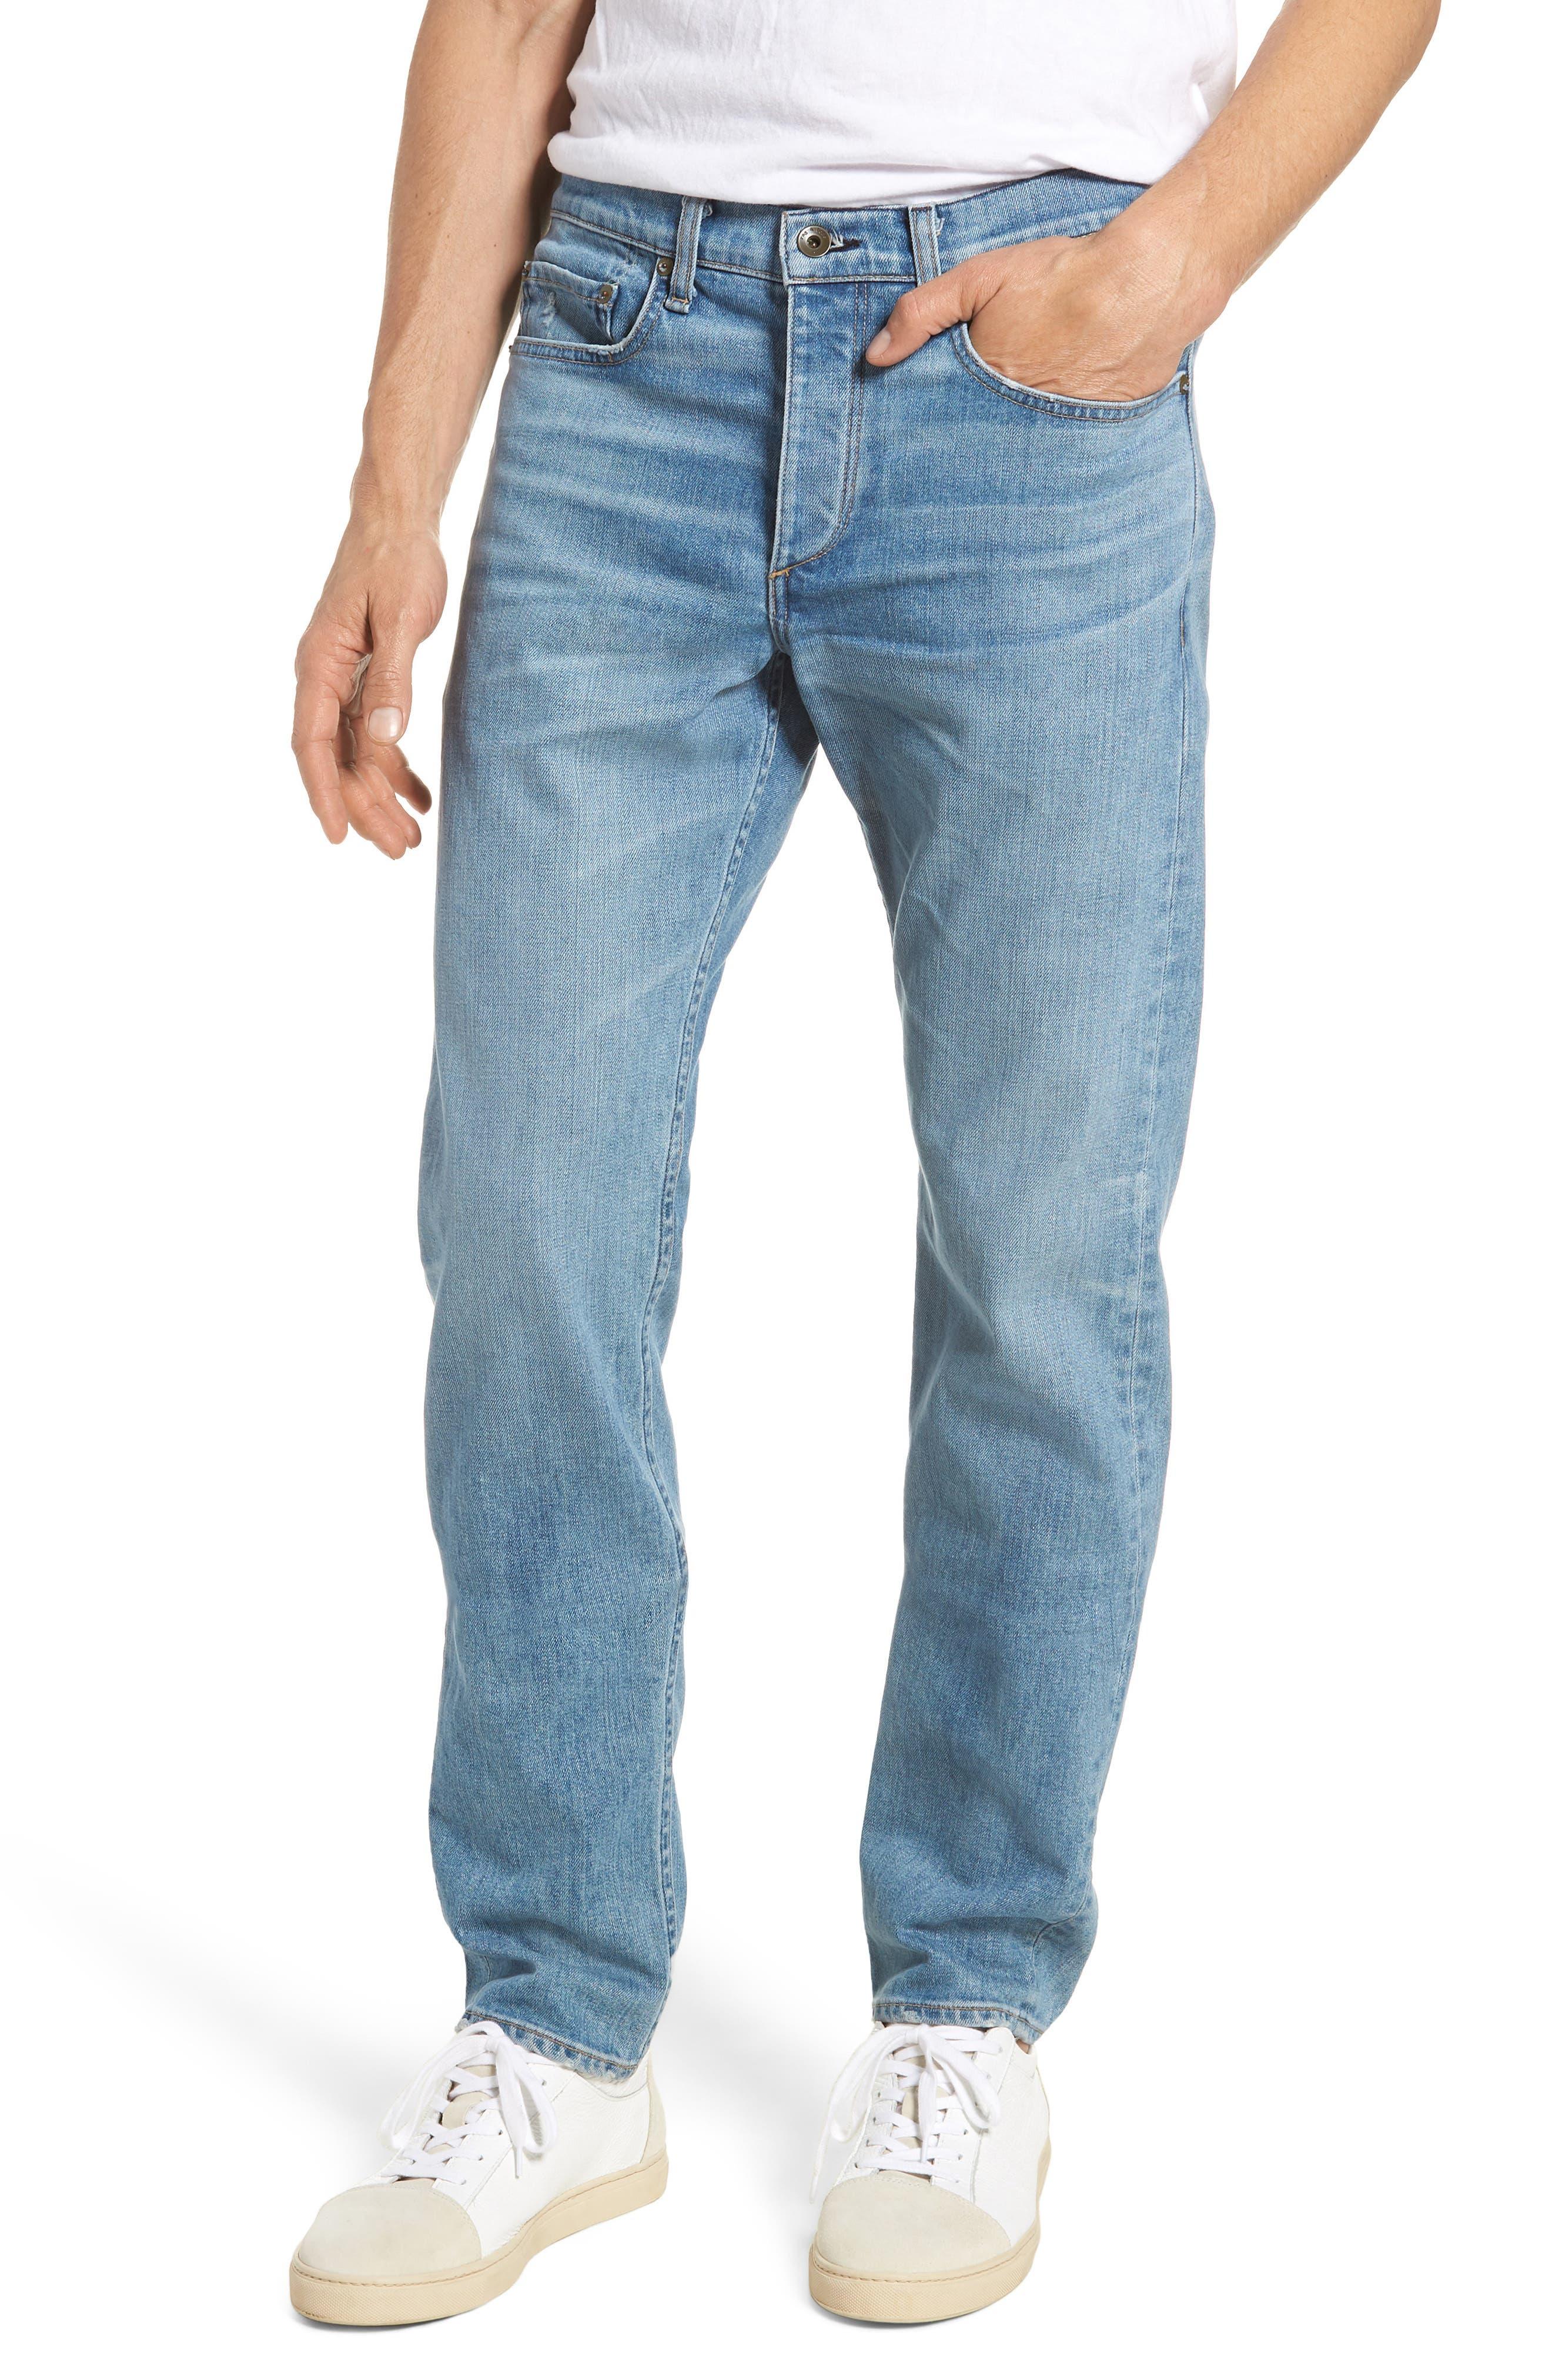 Fit 2 Slim Fit Jeans,                         Main,                         color, Pylle